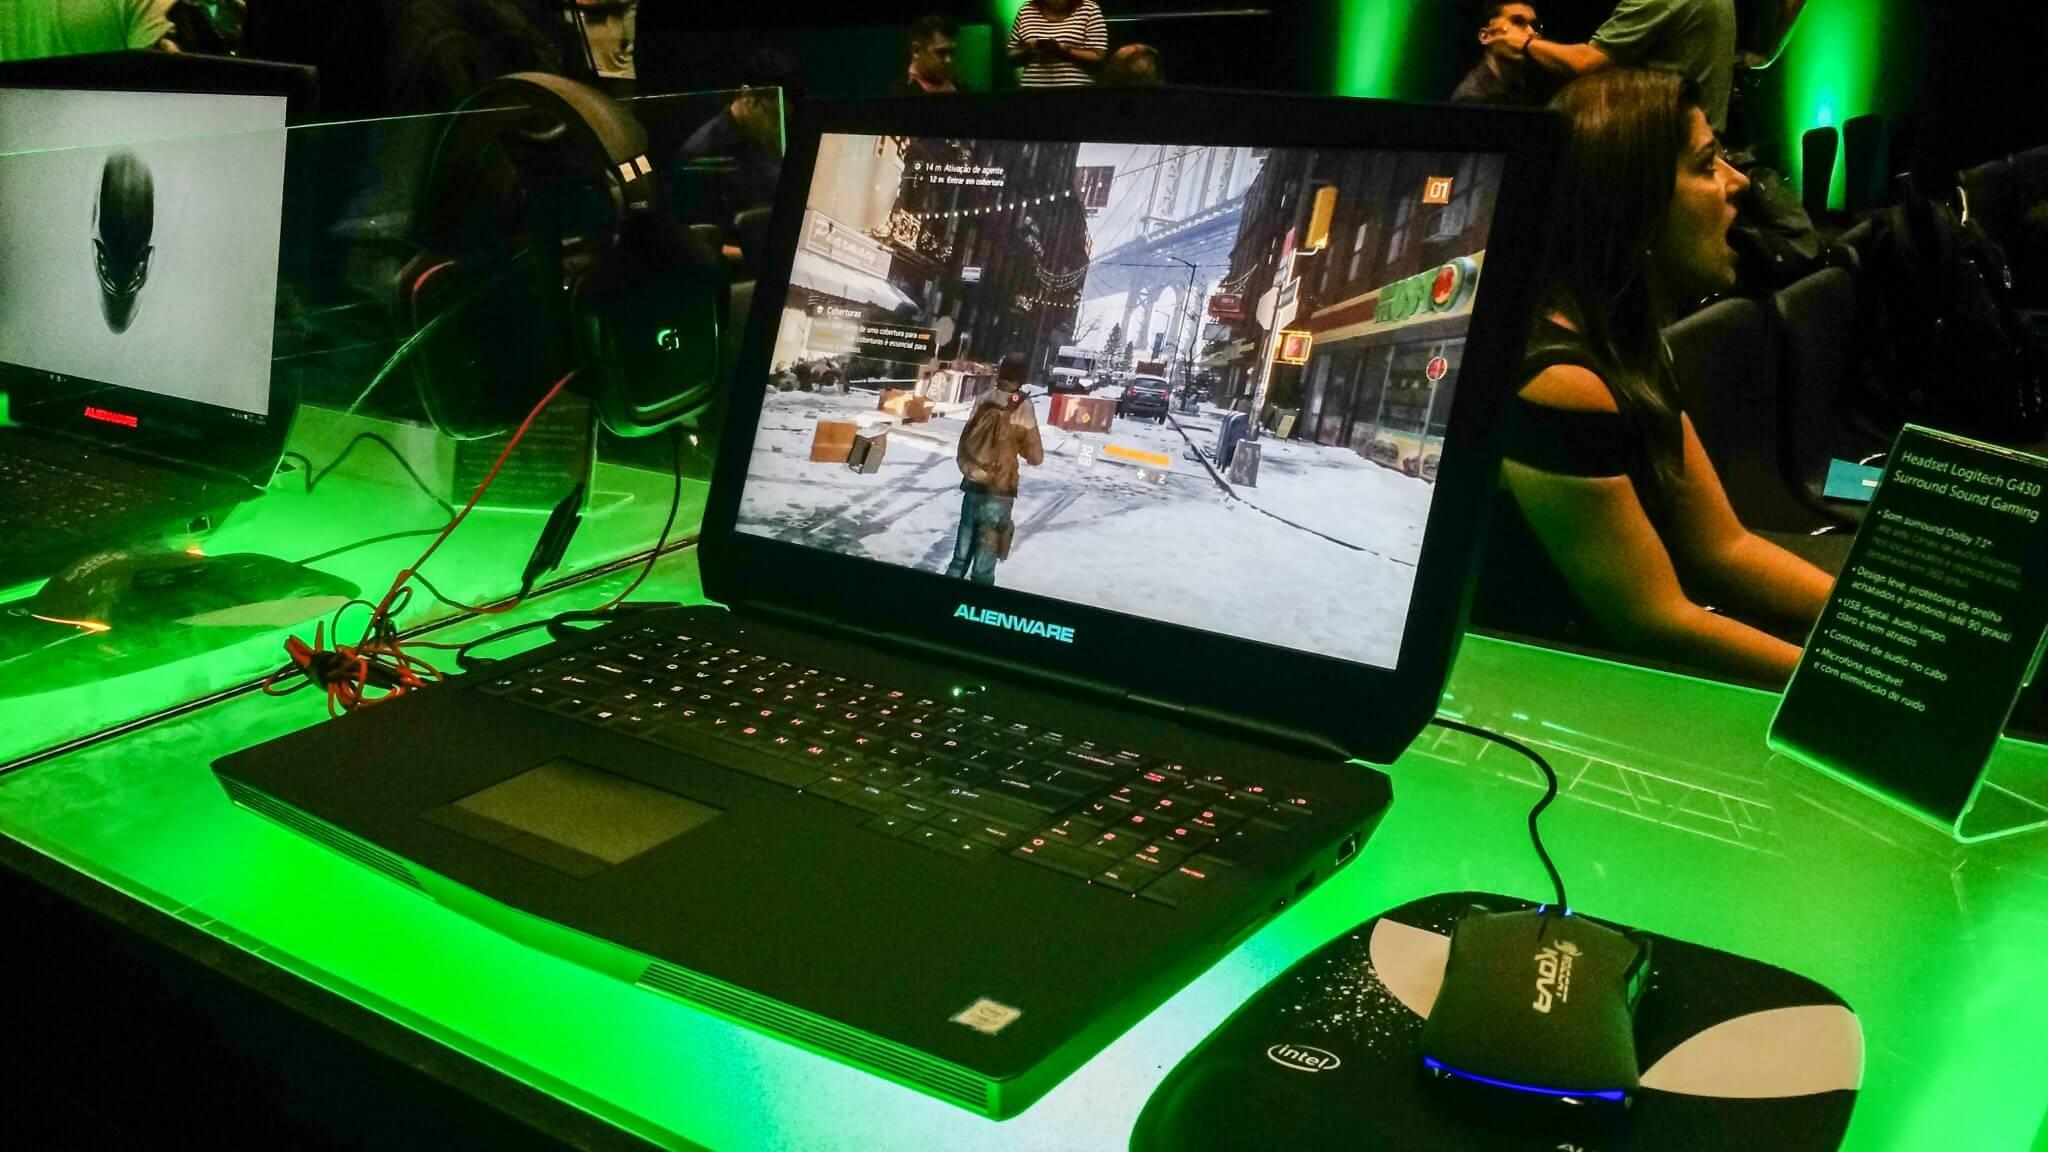 Dell relança marca Alienware no Brasil: conheça os modelos 7